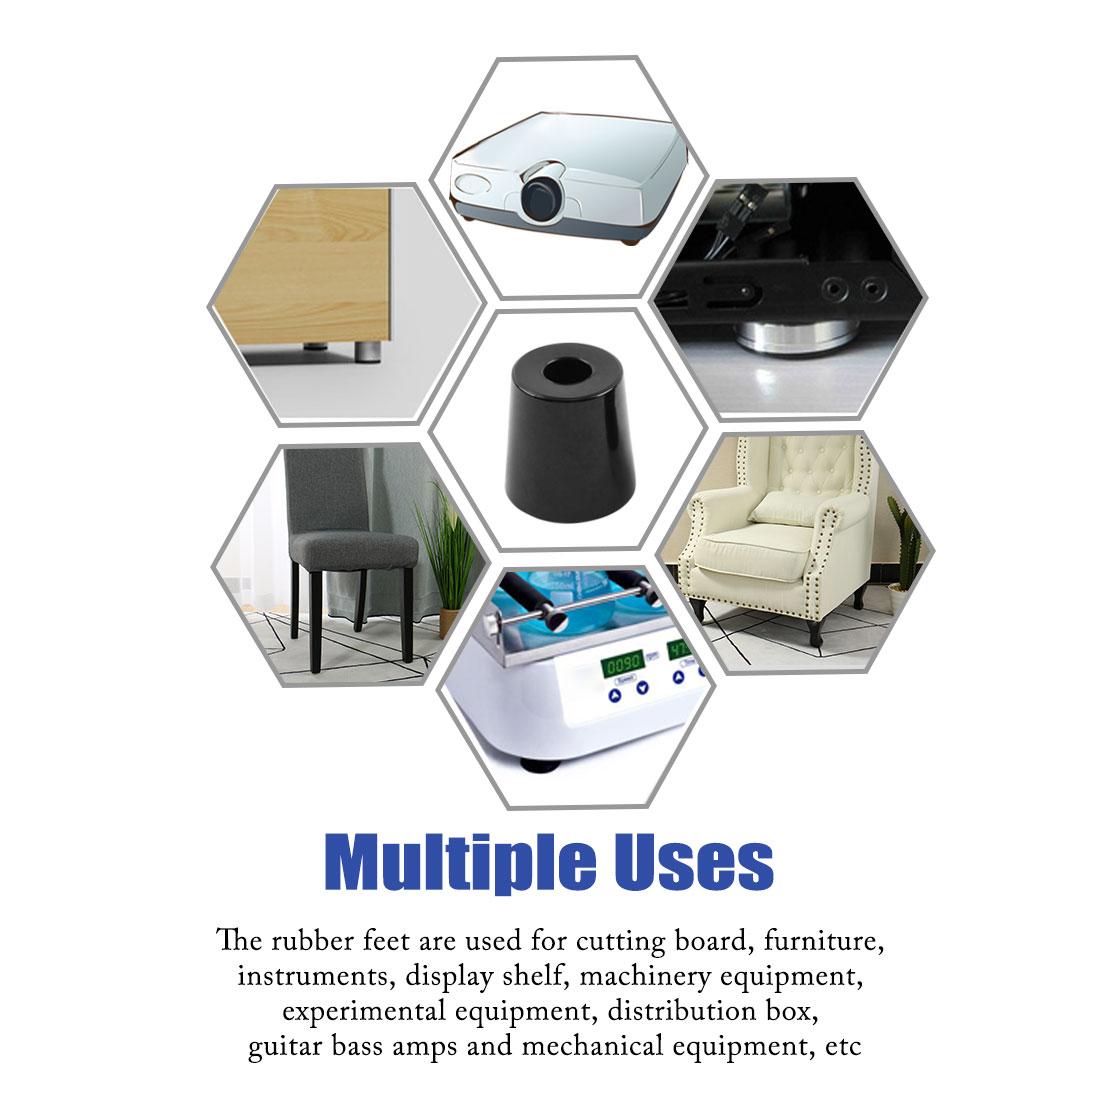 35pcs Rubber Feet Bumper Cabinet Amplifier Speaker Desk Leg Pads, D33x27xH33mm - image 6 of 7